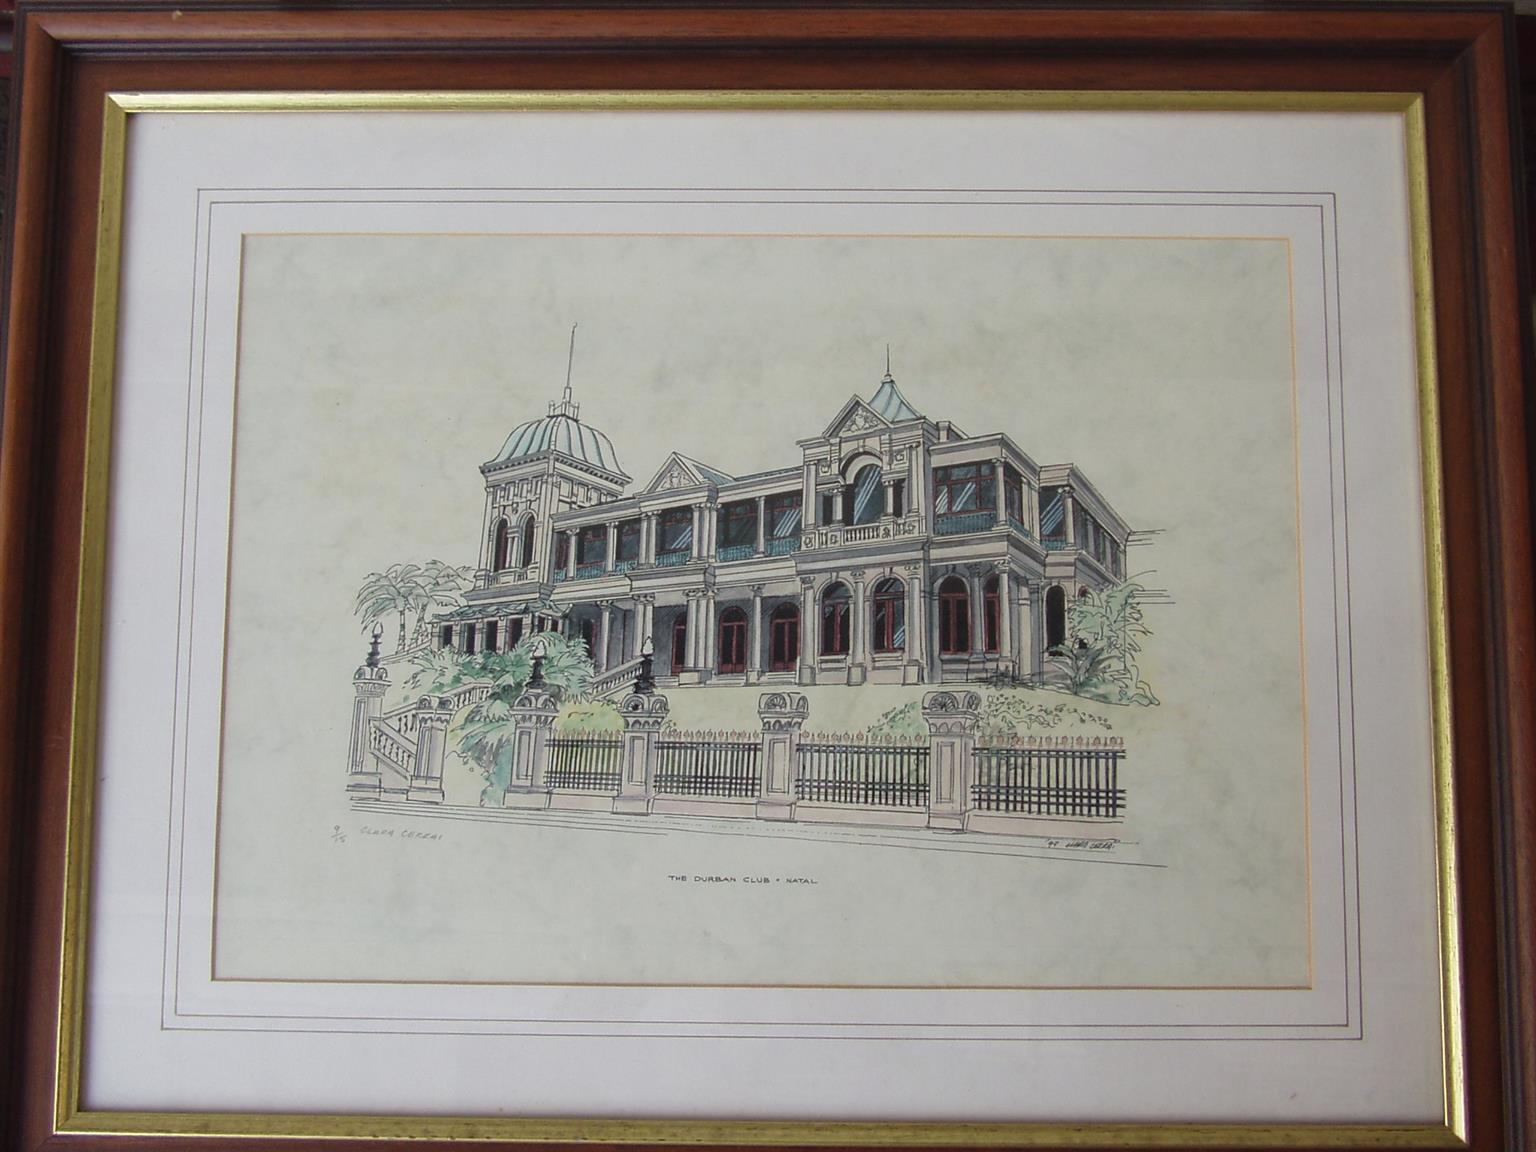 Durban Club - Framed Sketch by Clara Cerrai   - in excellent condition